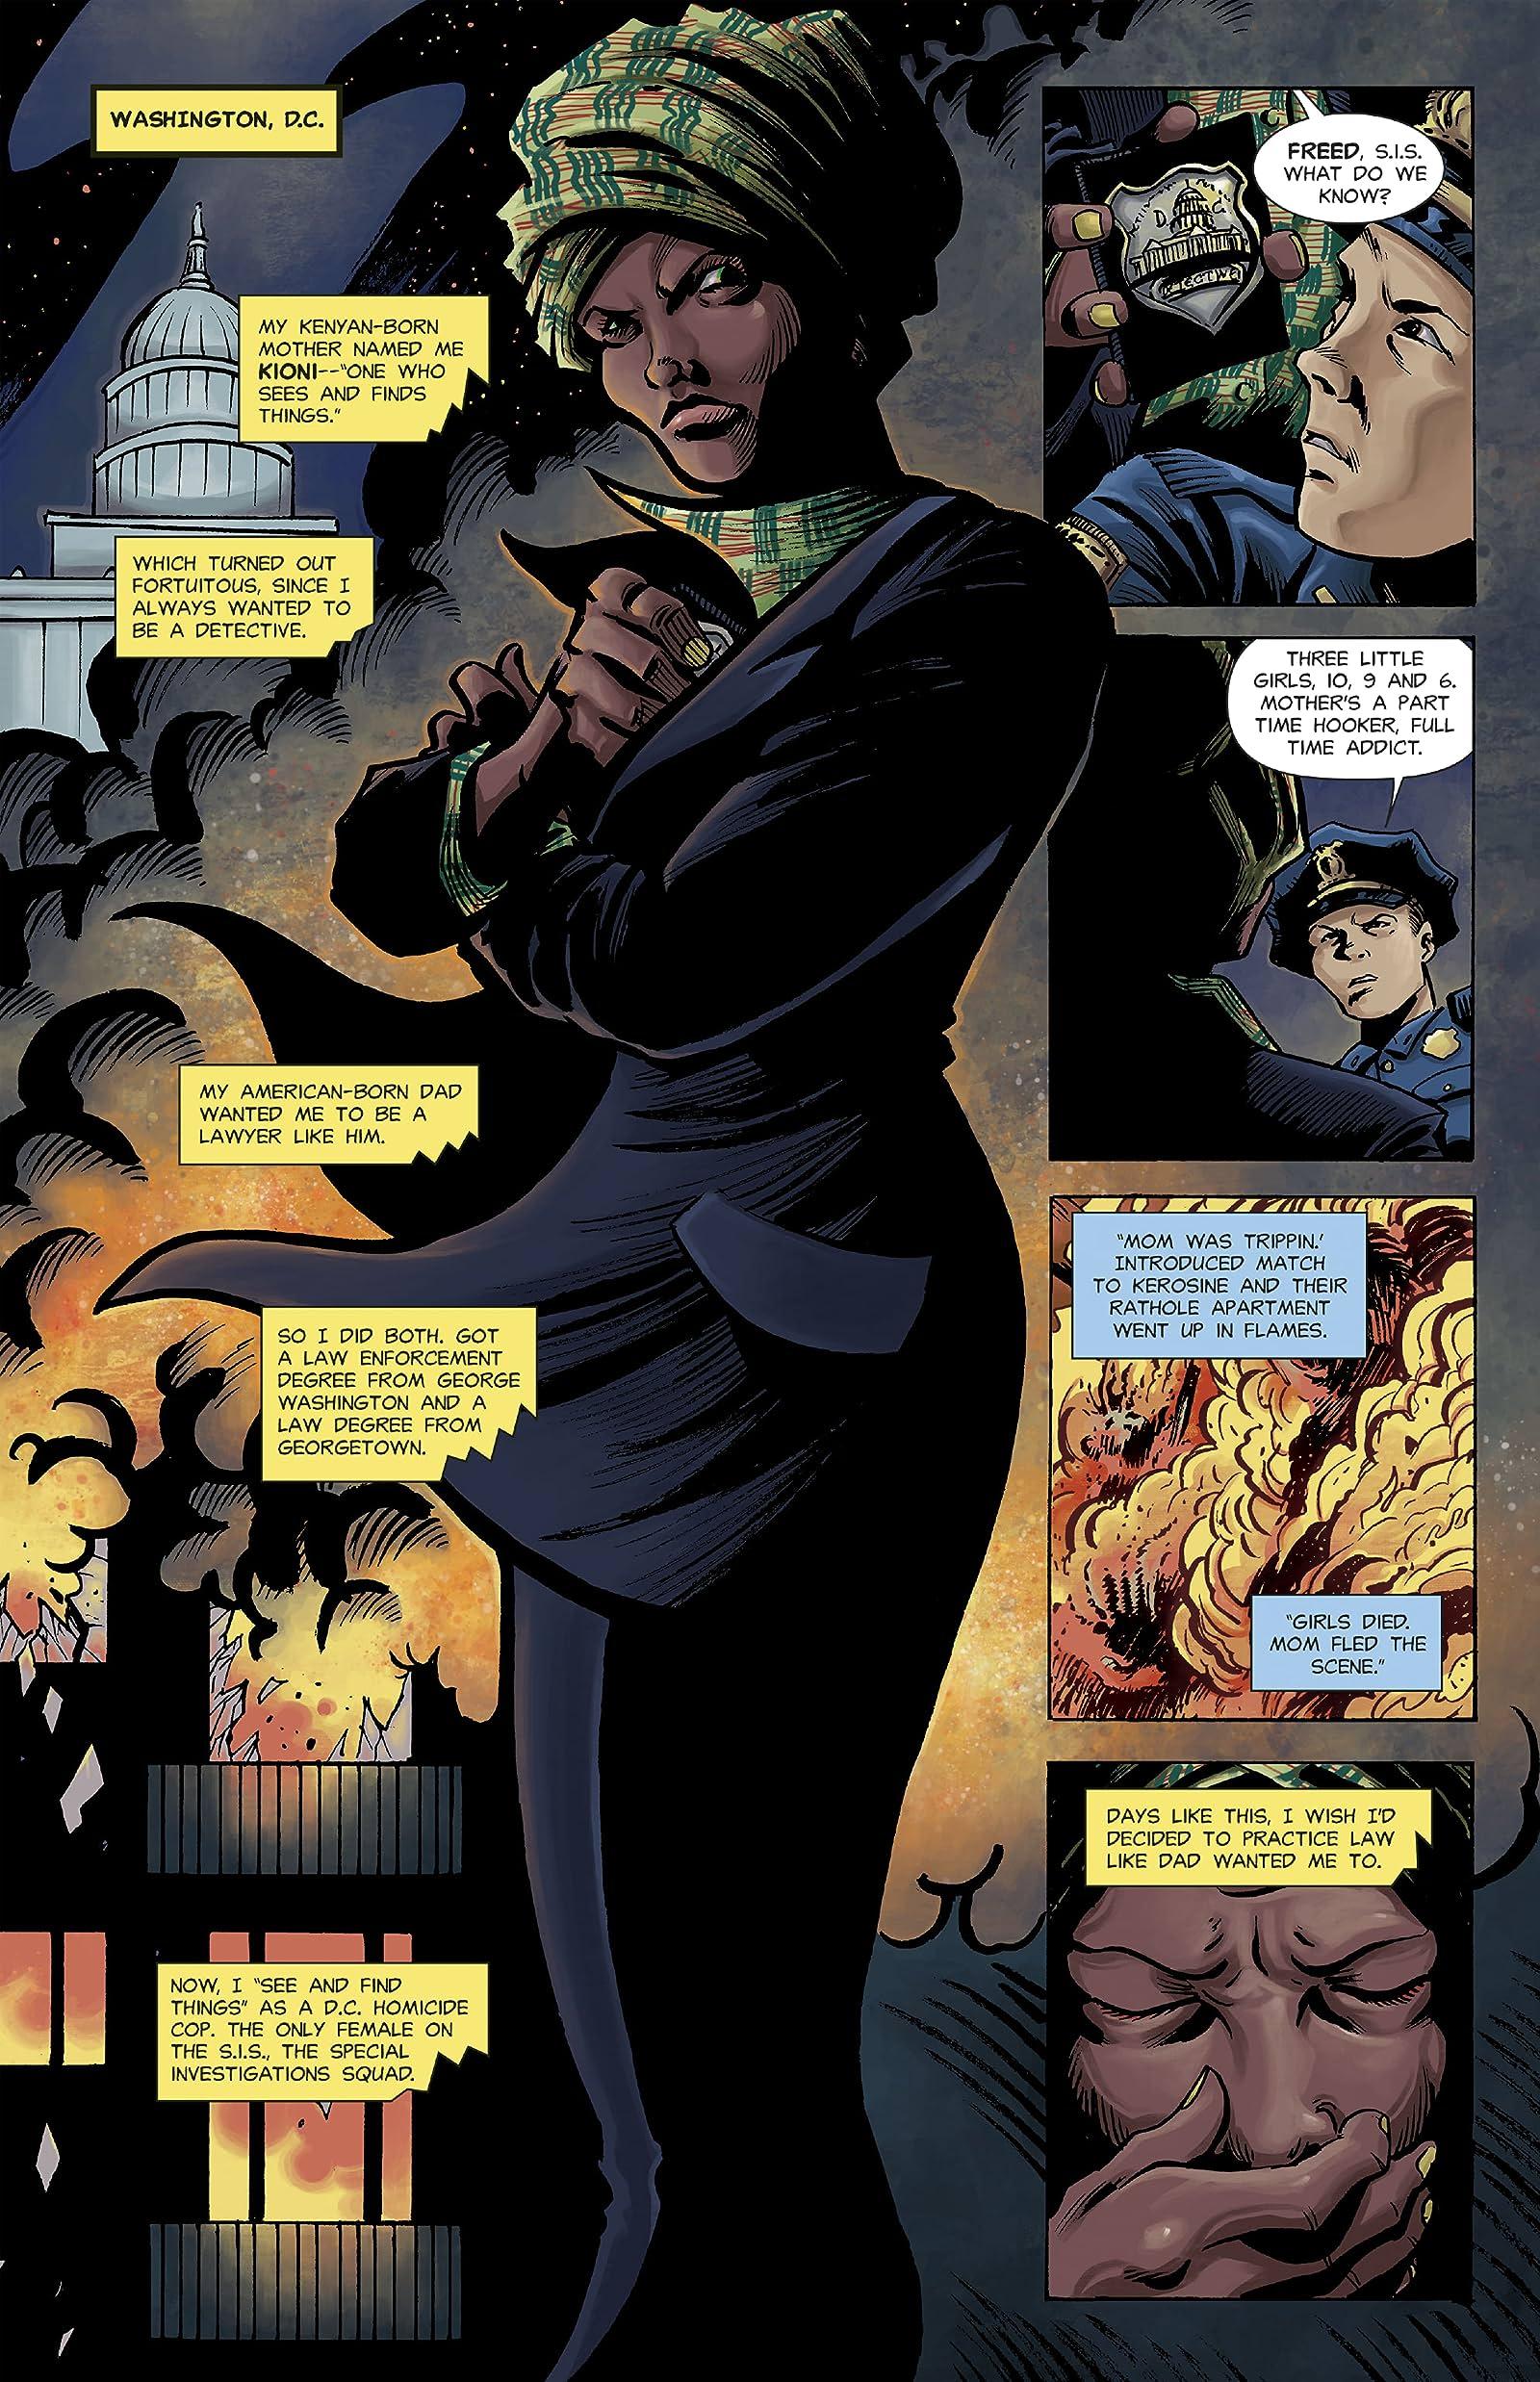 FREED #1 - Comics by comiXology